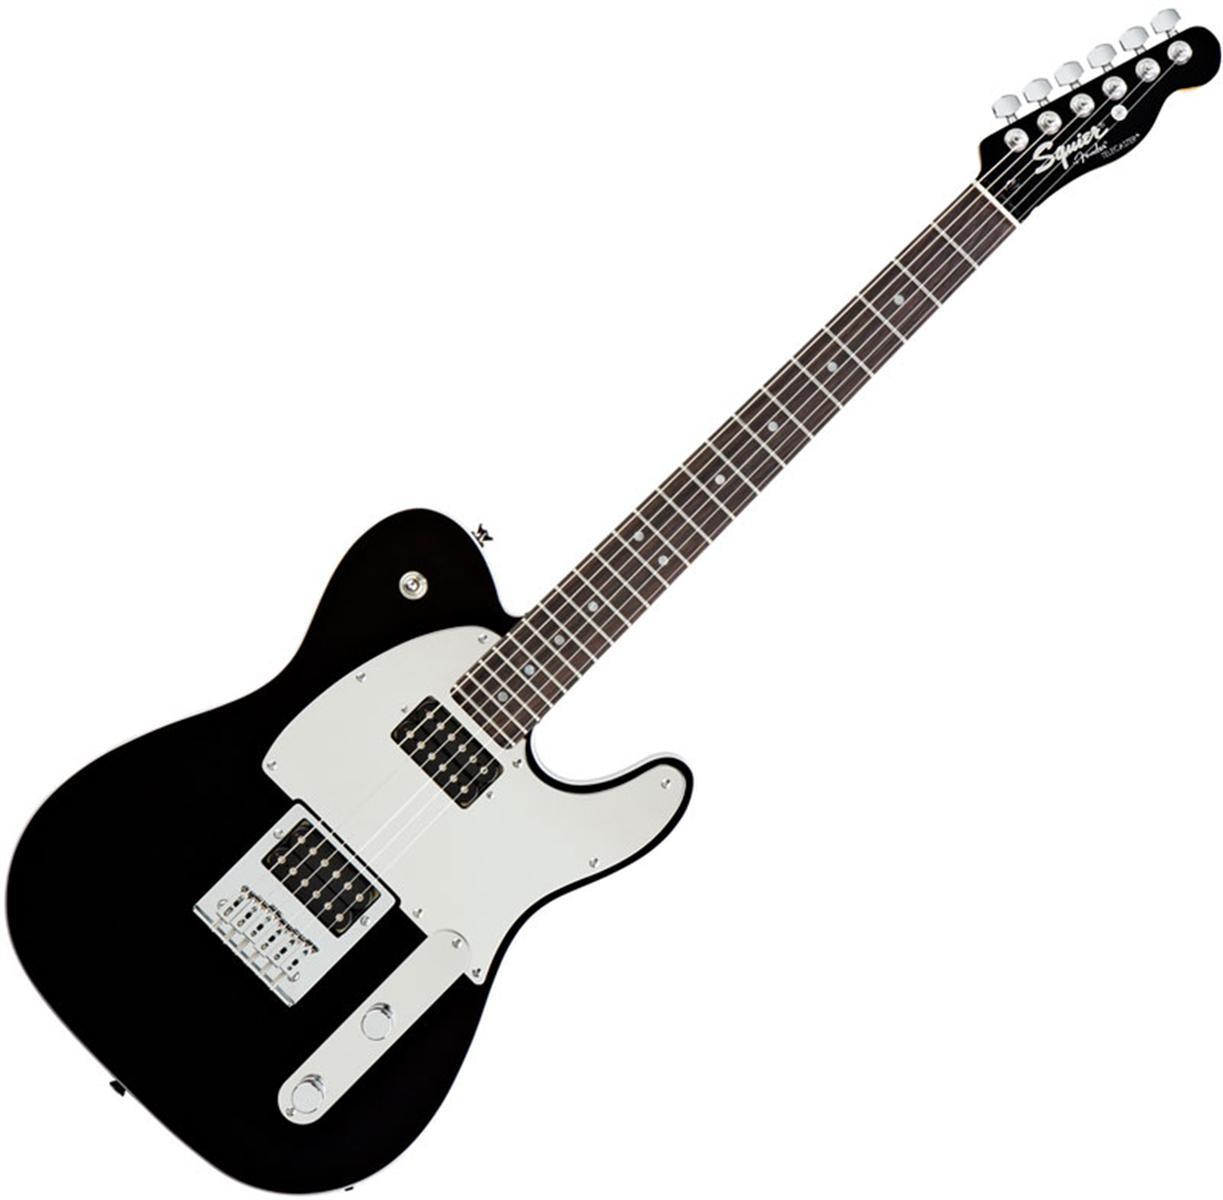 1223x1200 Guitar Clip Art Free